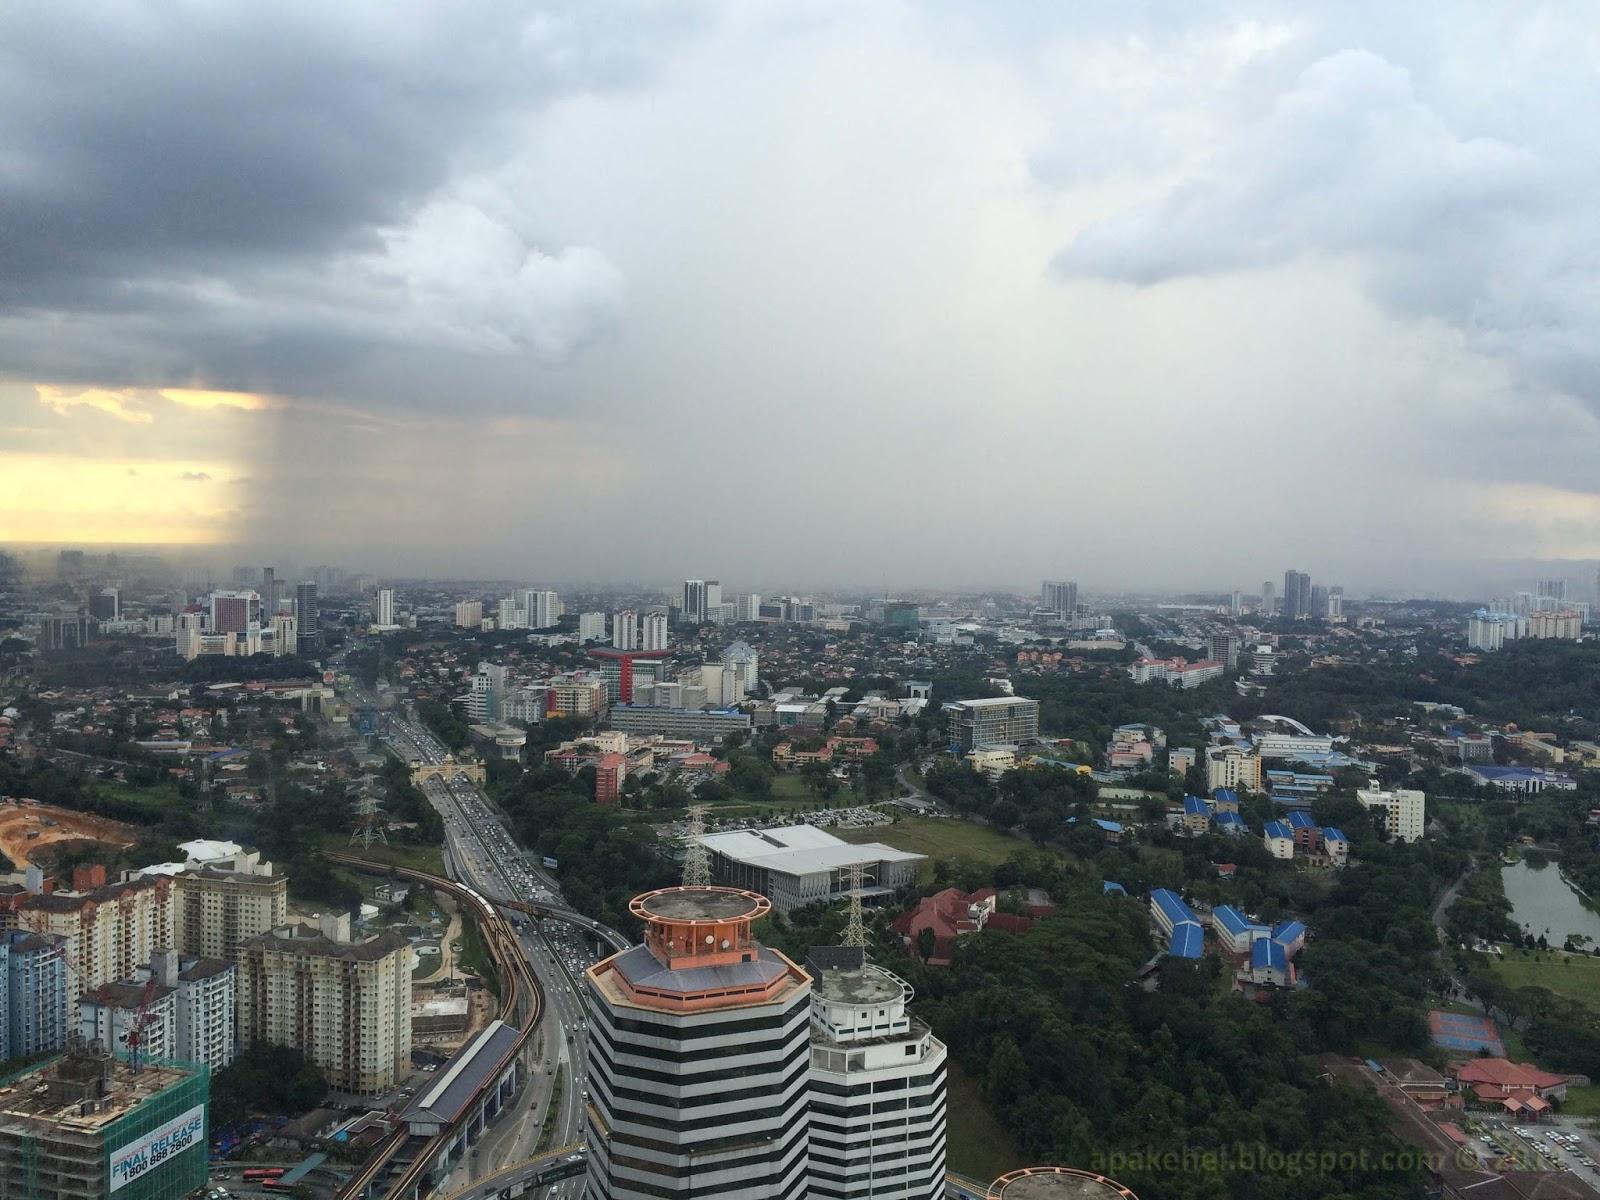 Hujan di waktu petang